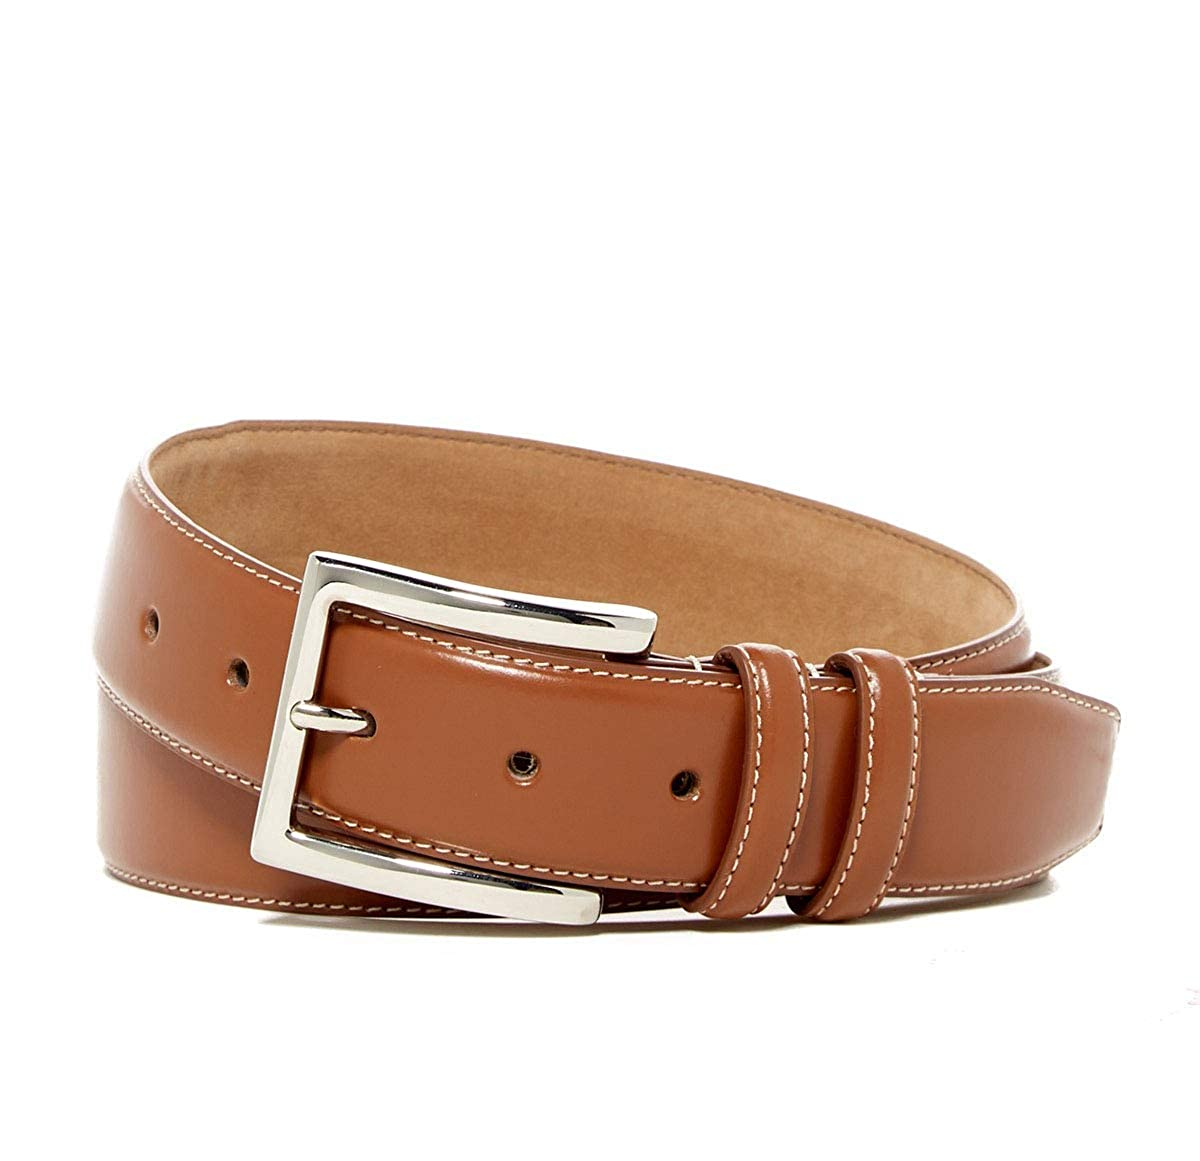 Size 34 Cognac Cole Haan Mens Feather Edge Leather Belt